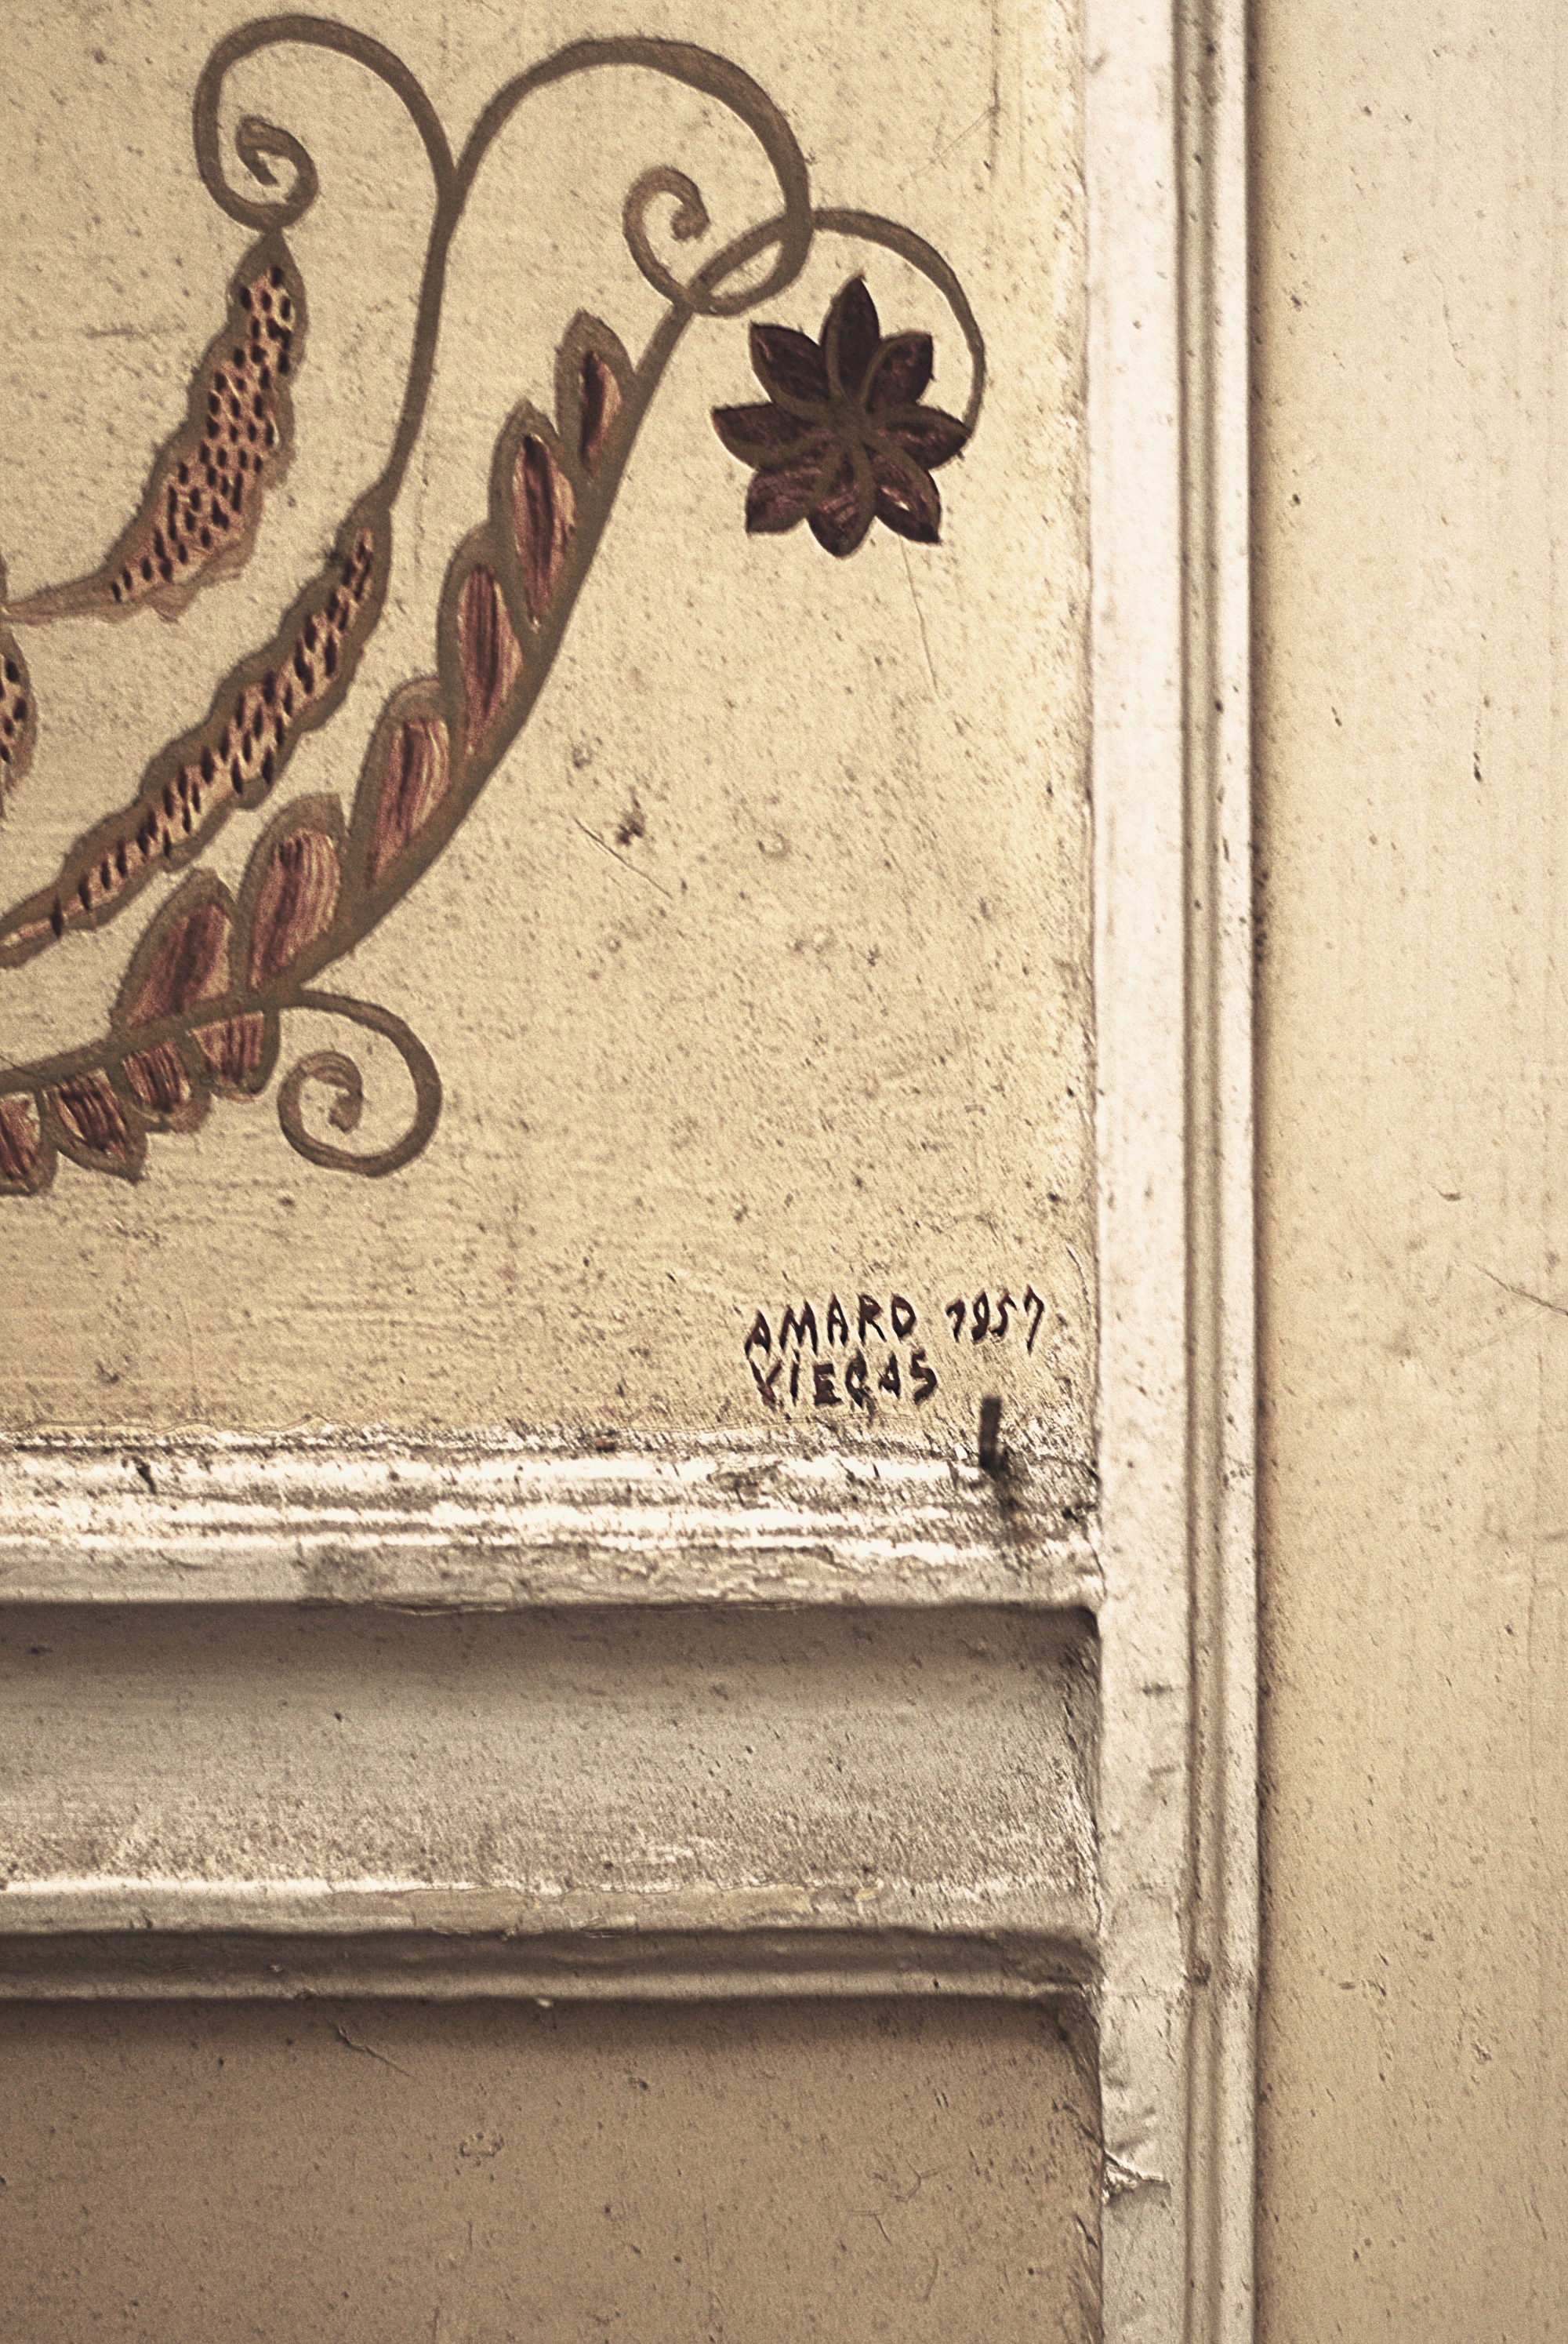 Detailes gravados / Ingrained Details